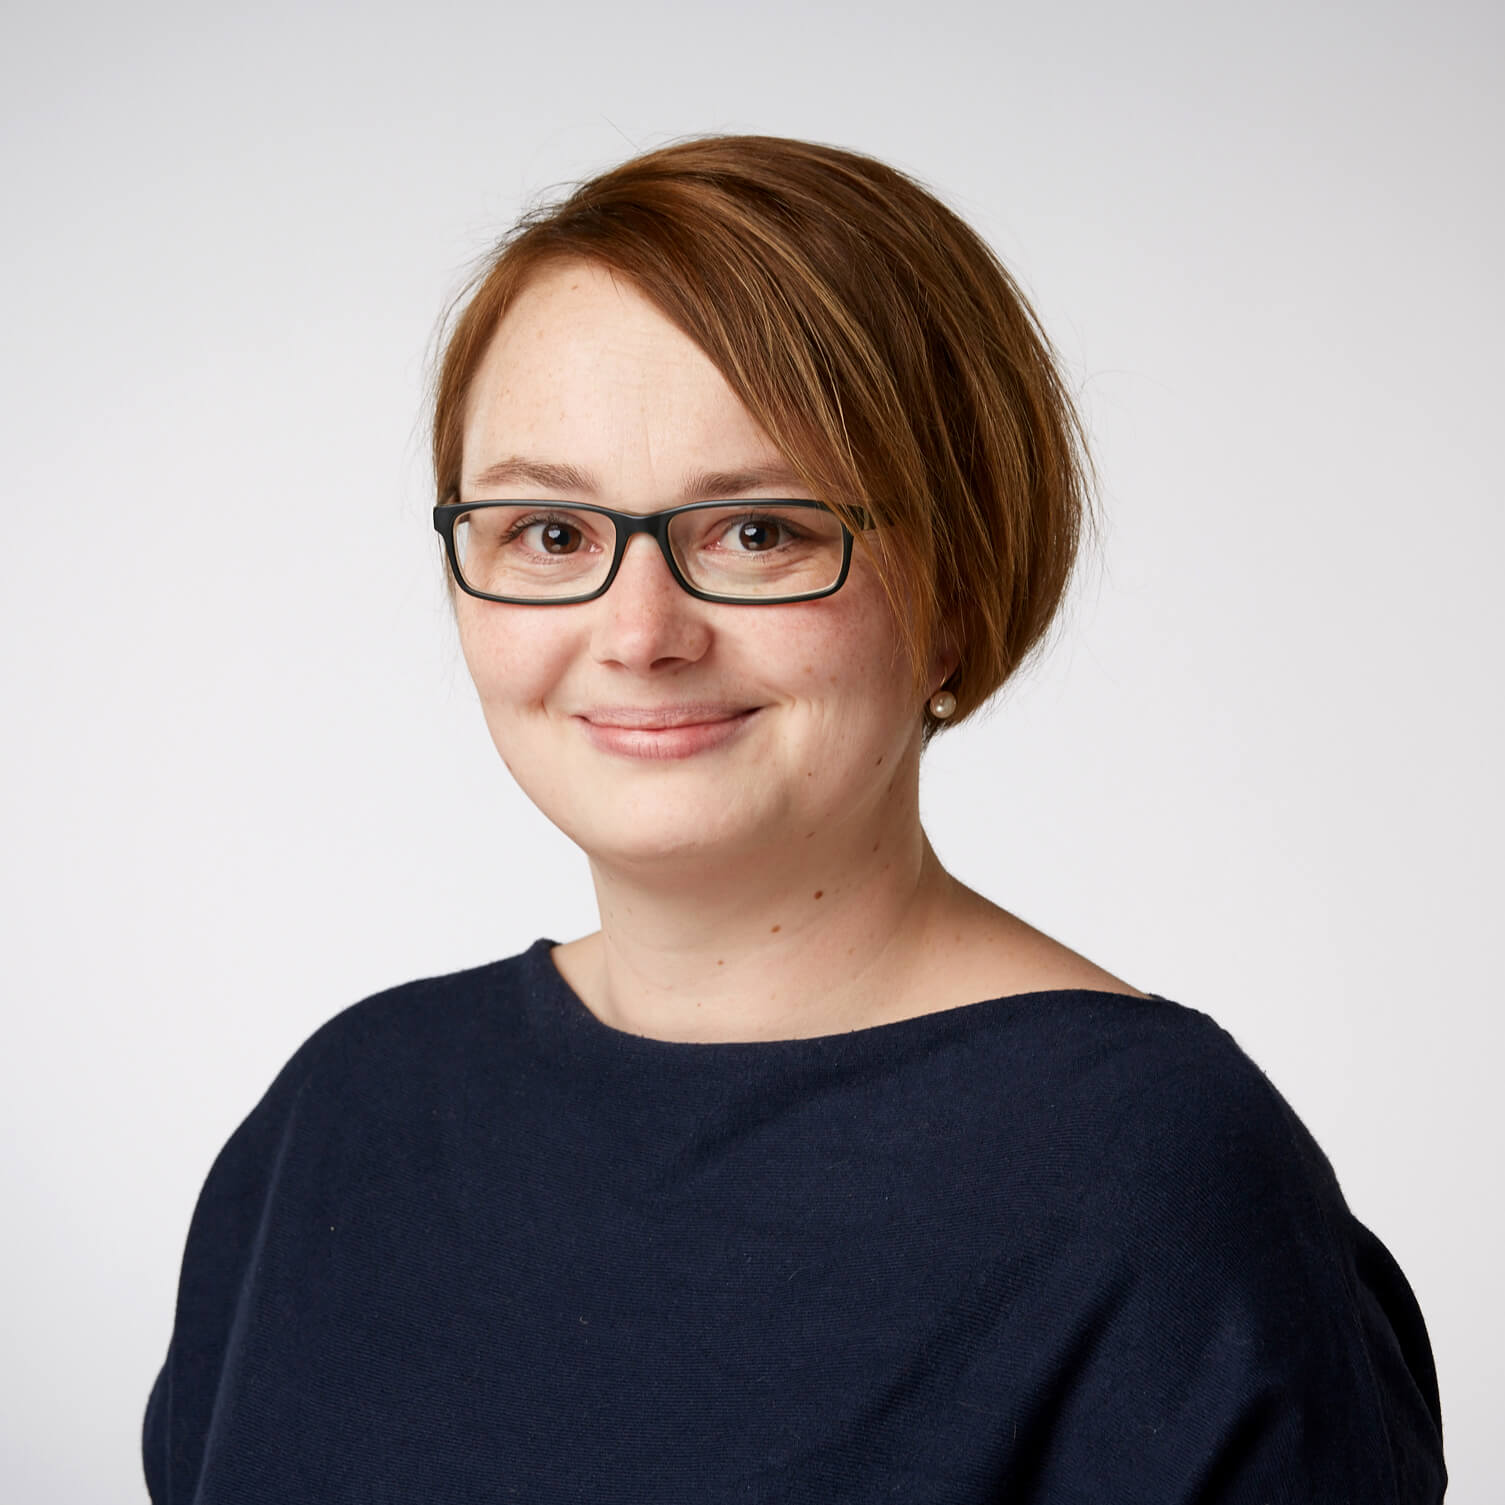 Susanne Oberleitner